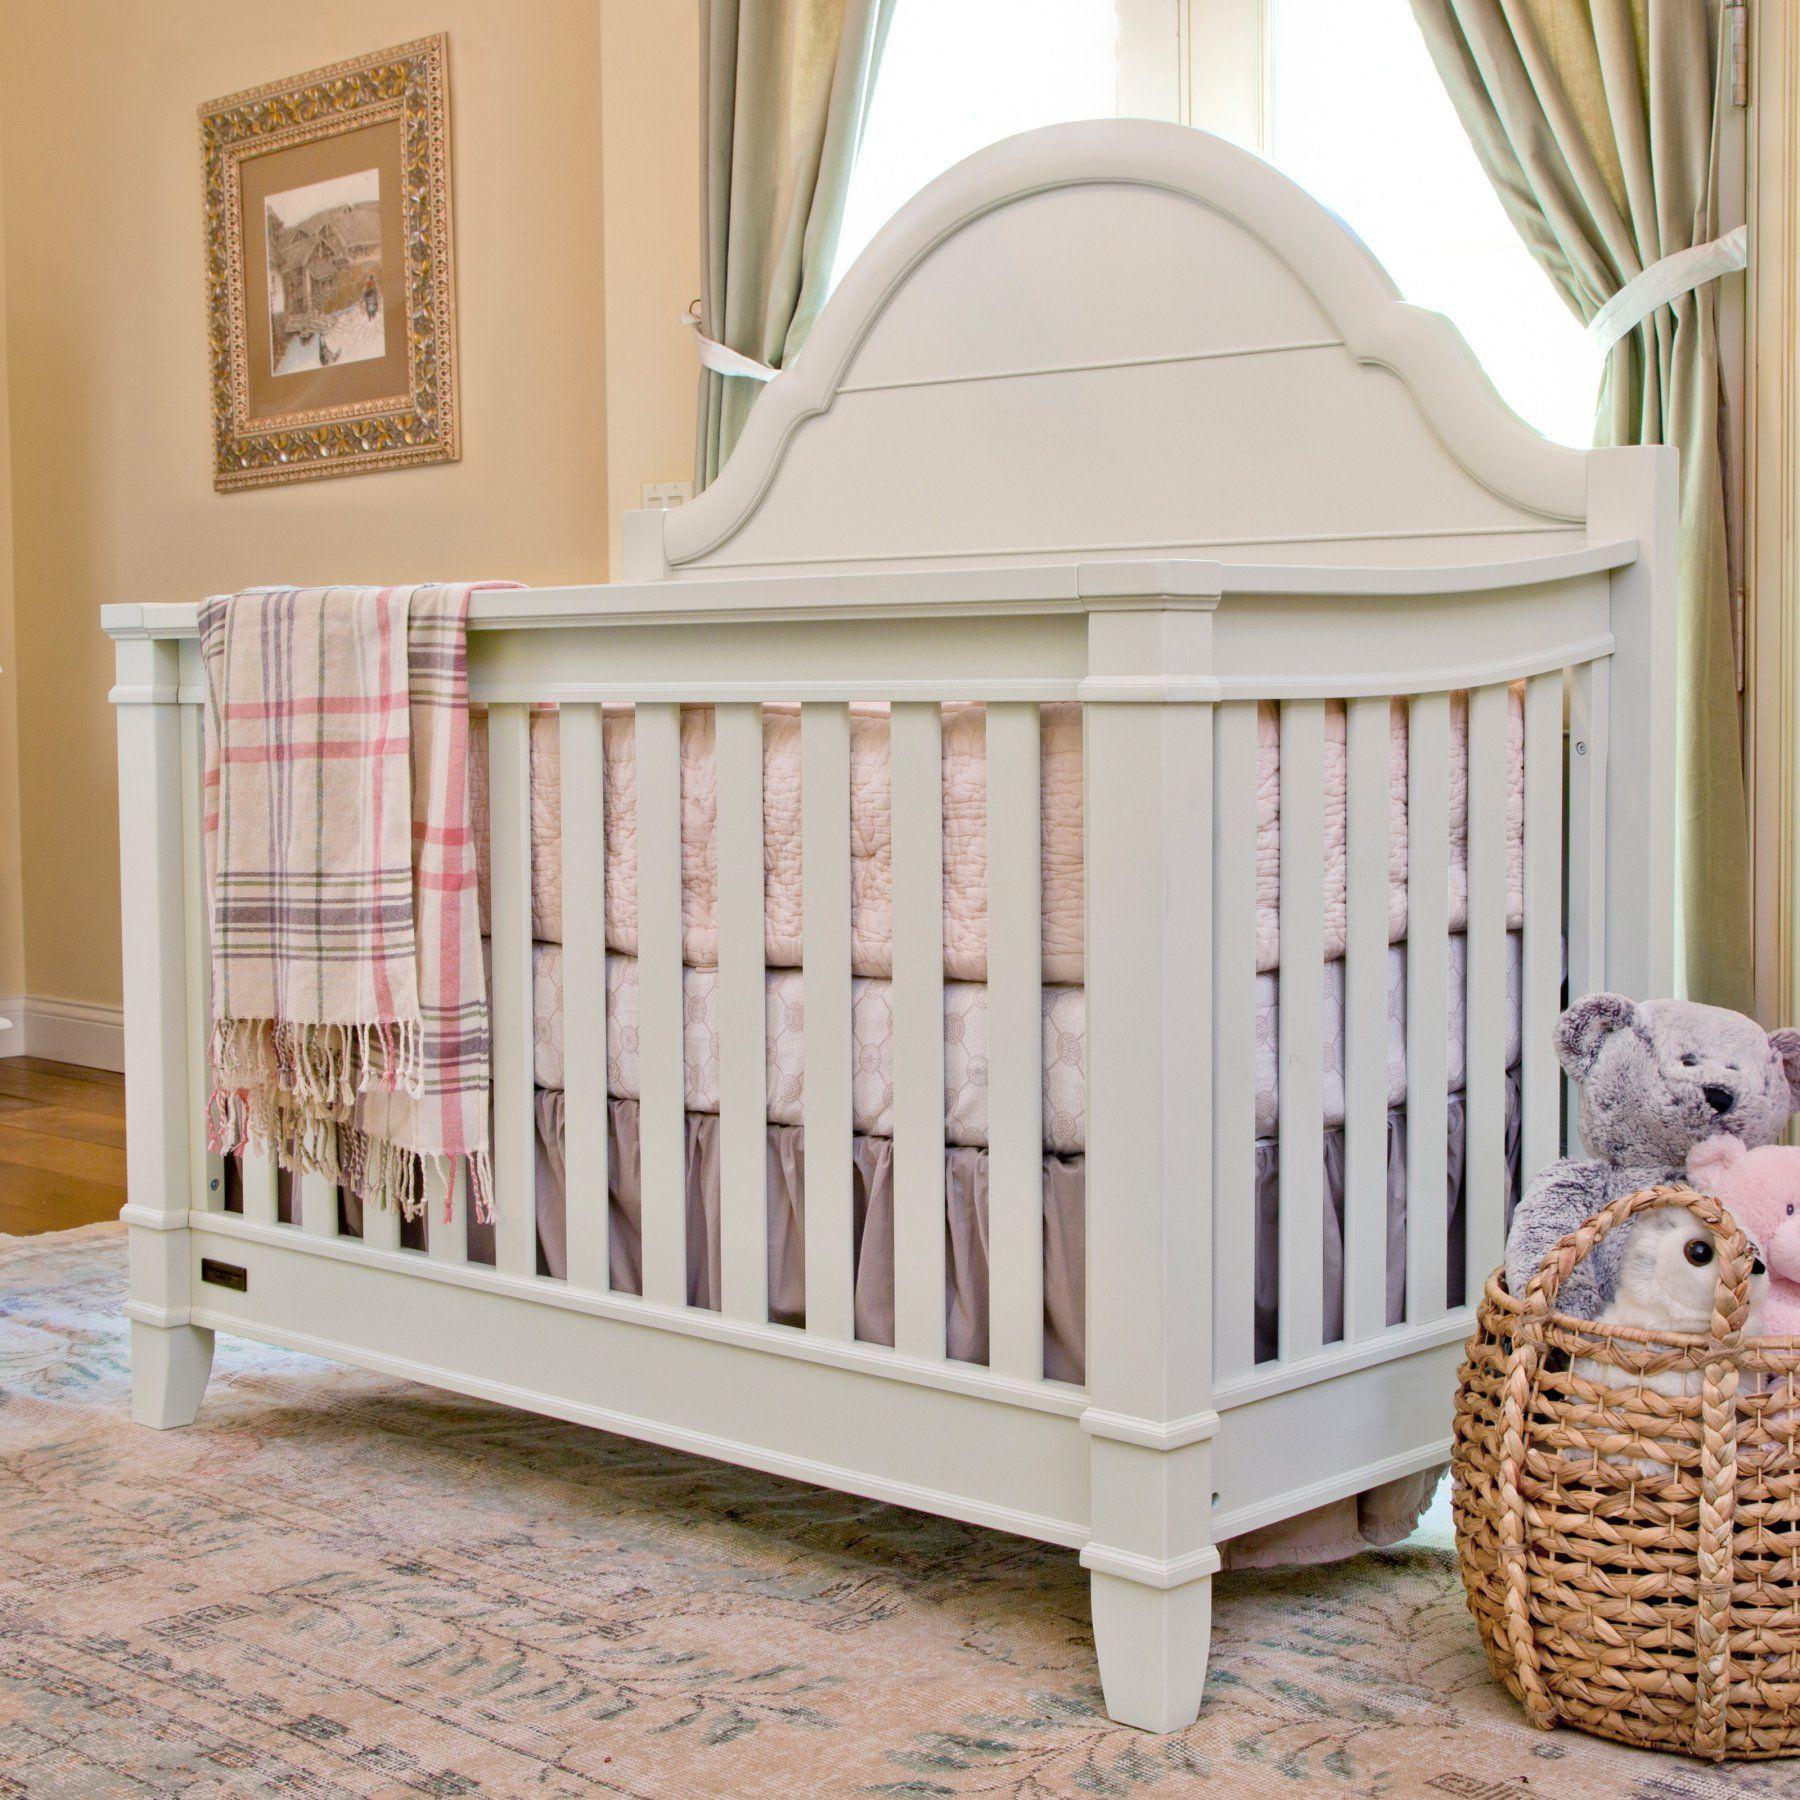 Million Dollar Baby Sullivan 4-in-1 Convertible Crib - M9201VW